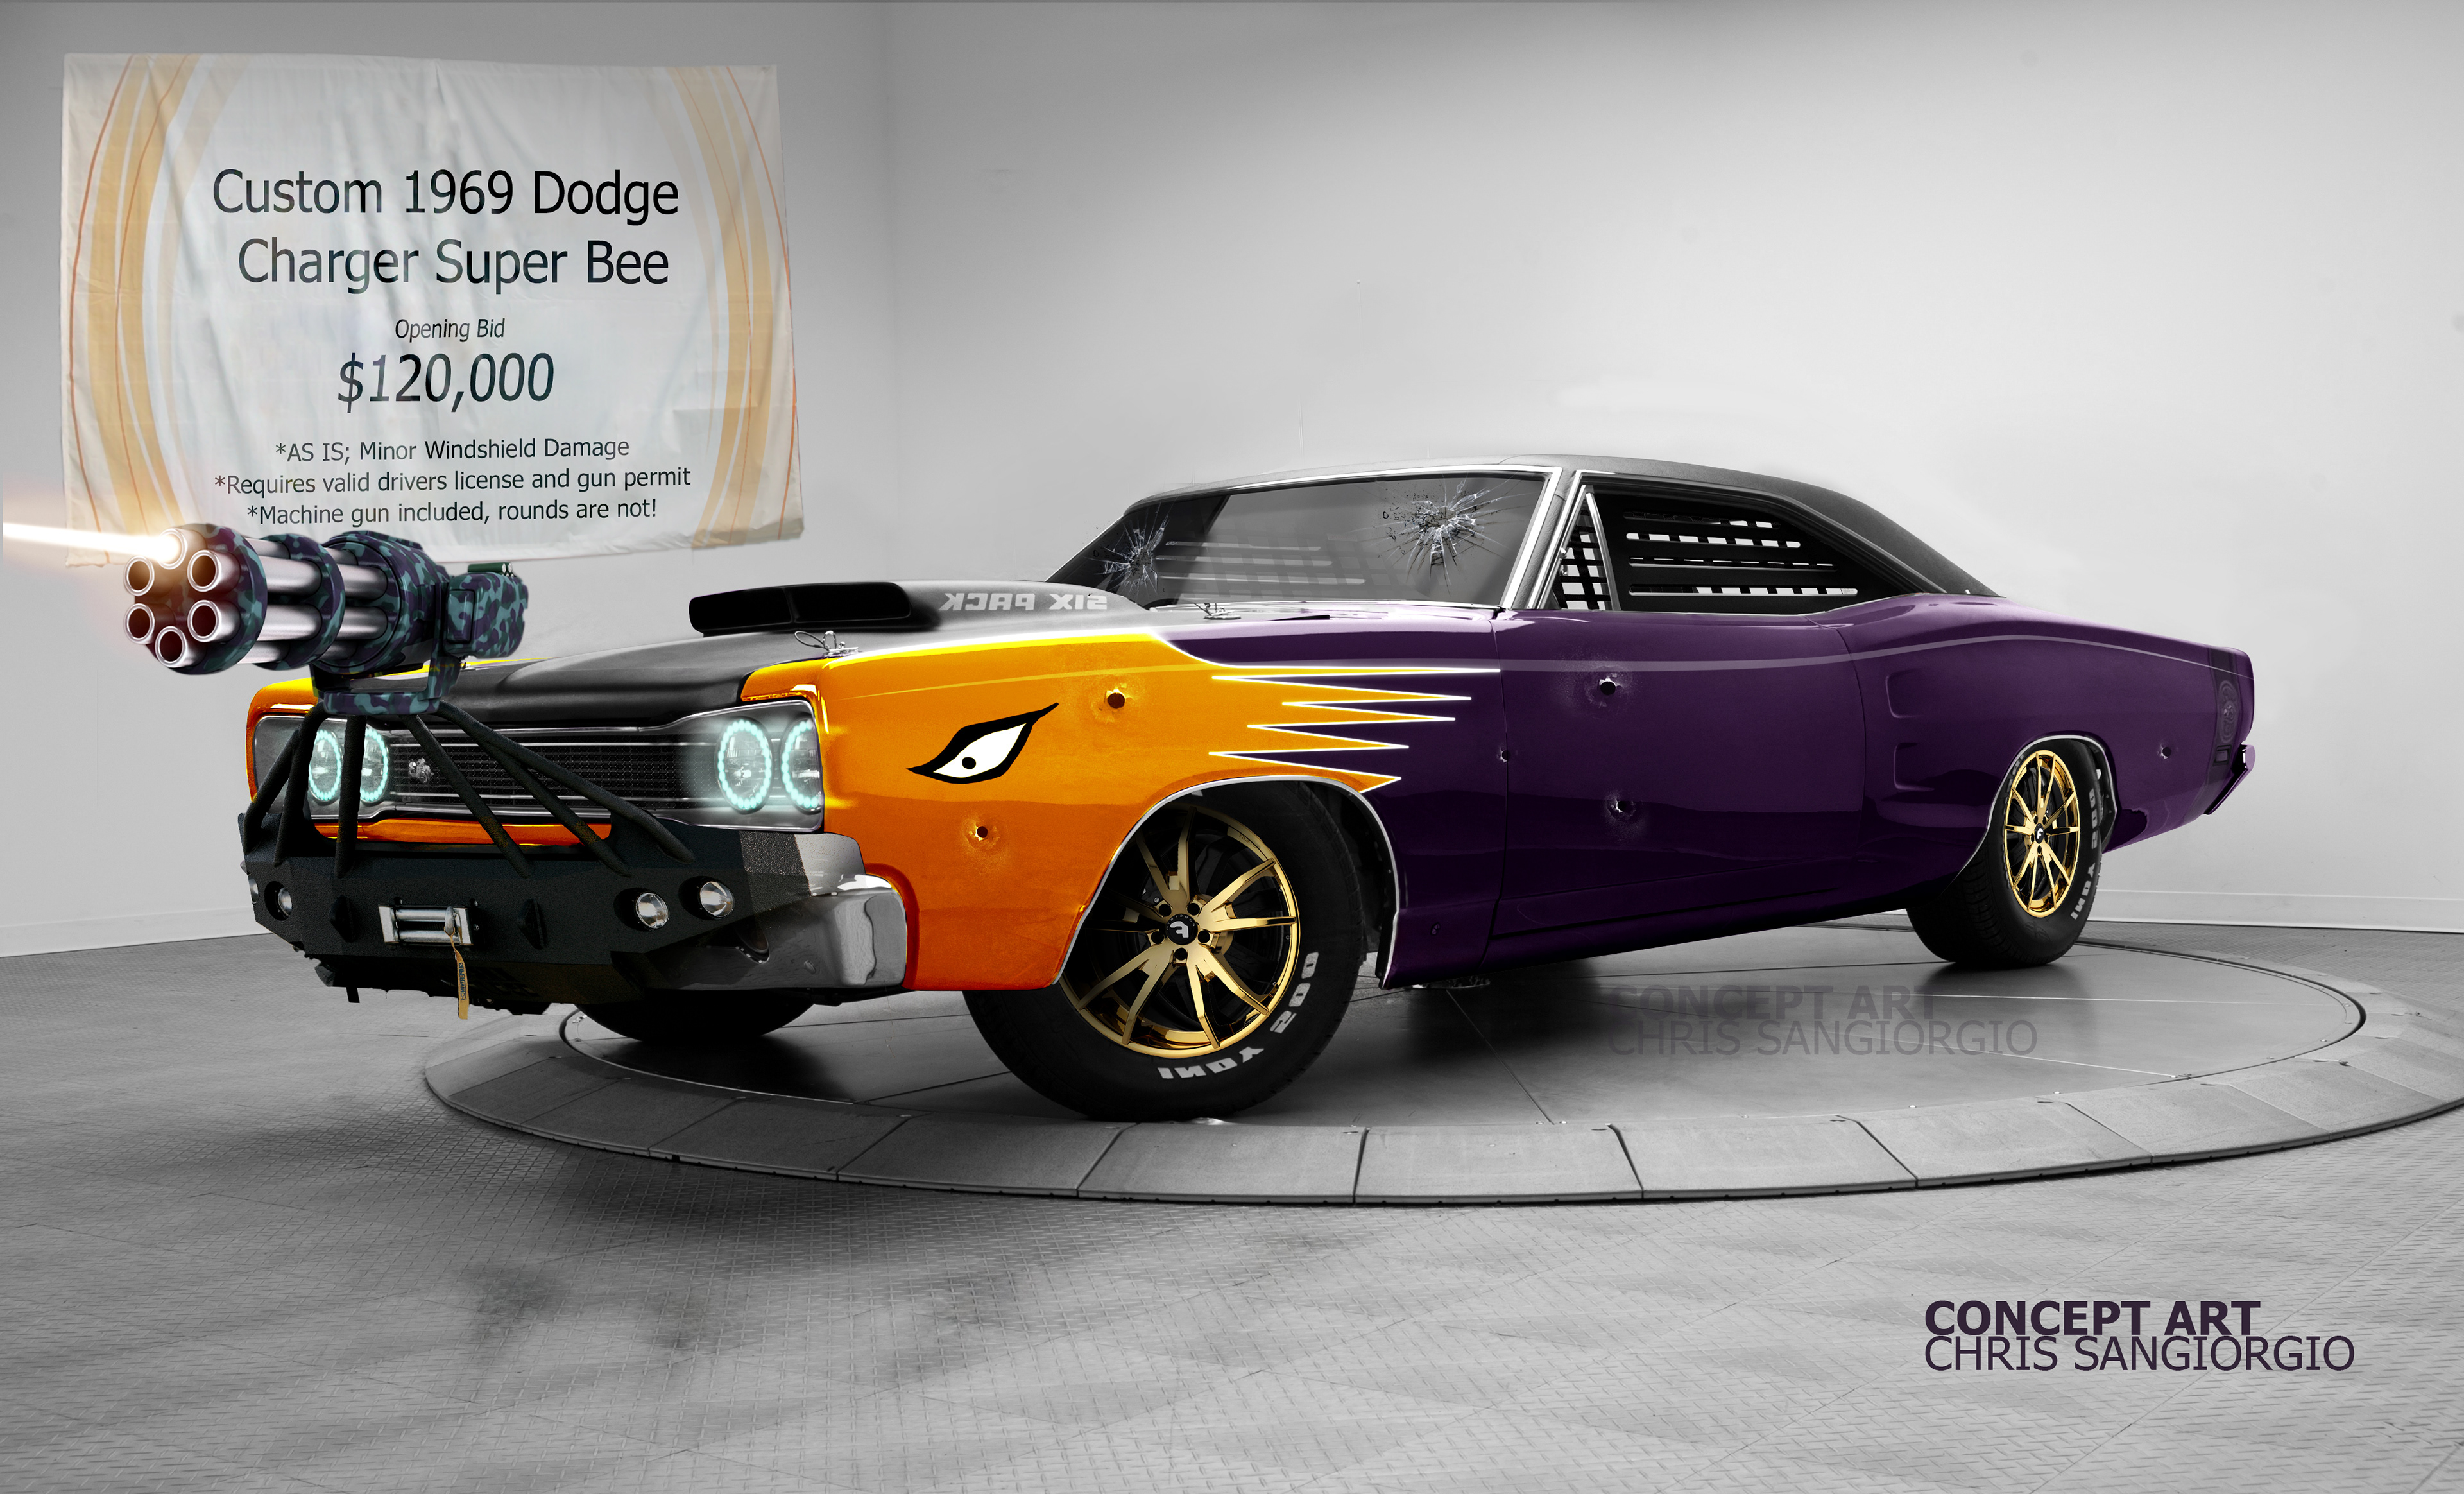 Chris Sangiorgio Concept Art El Carro De Duran 1969 Dodge Superbee